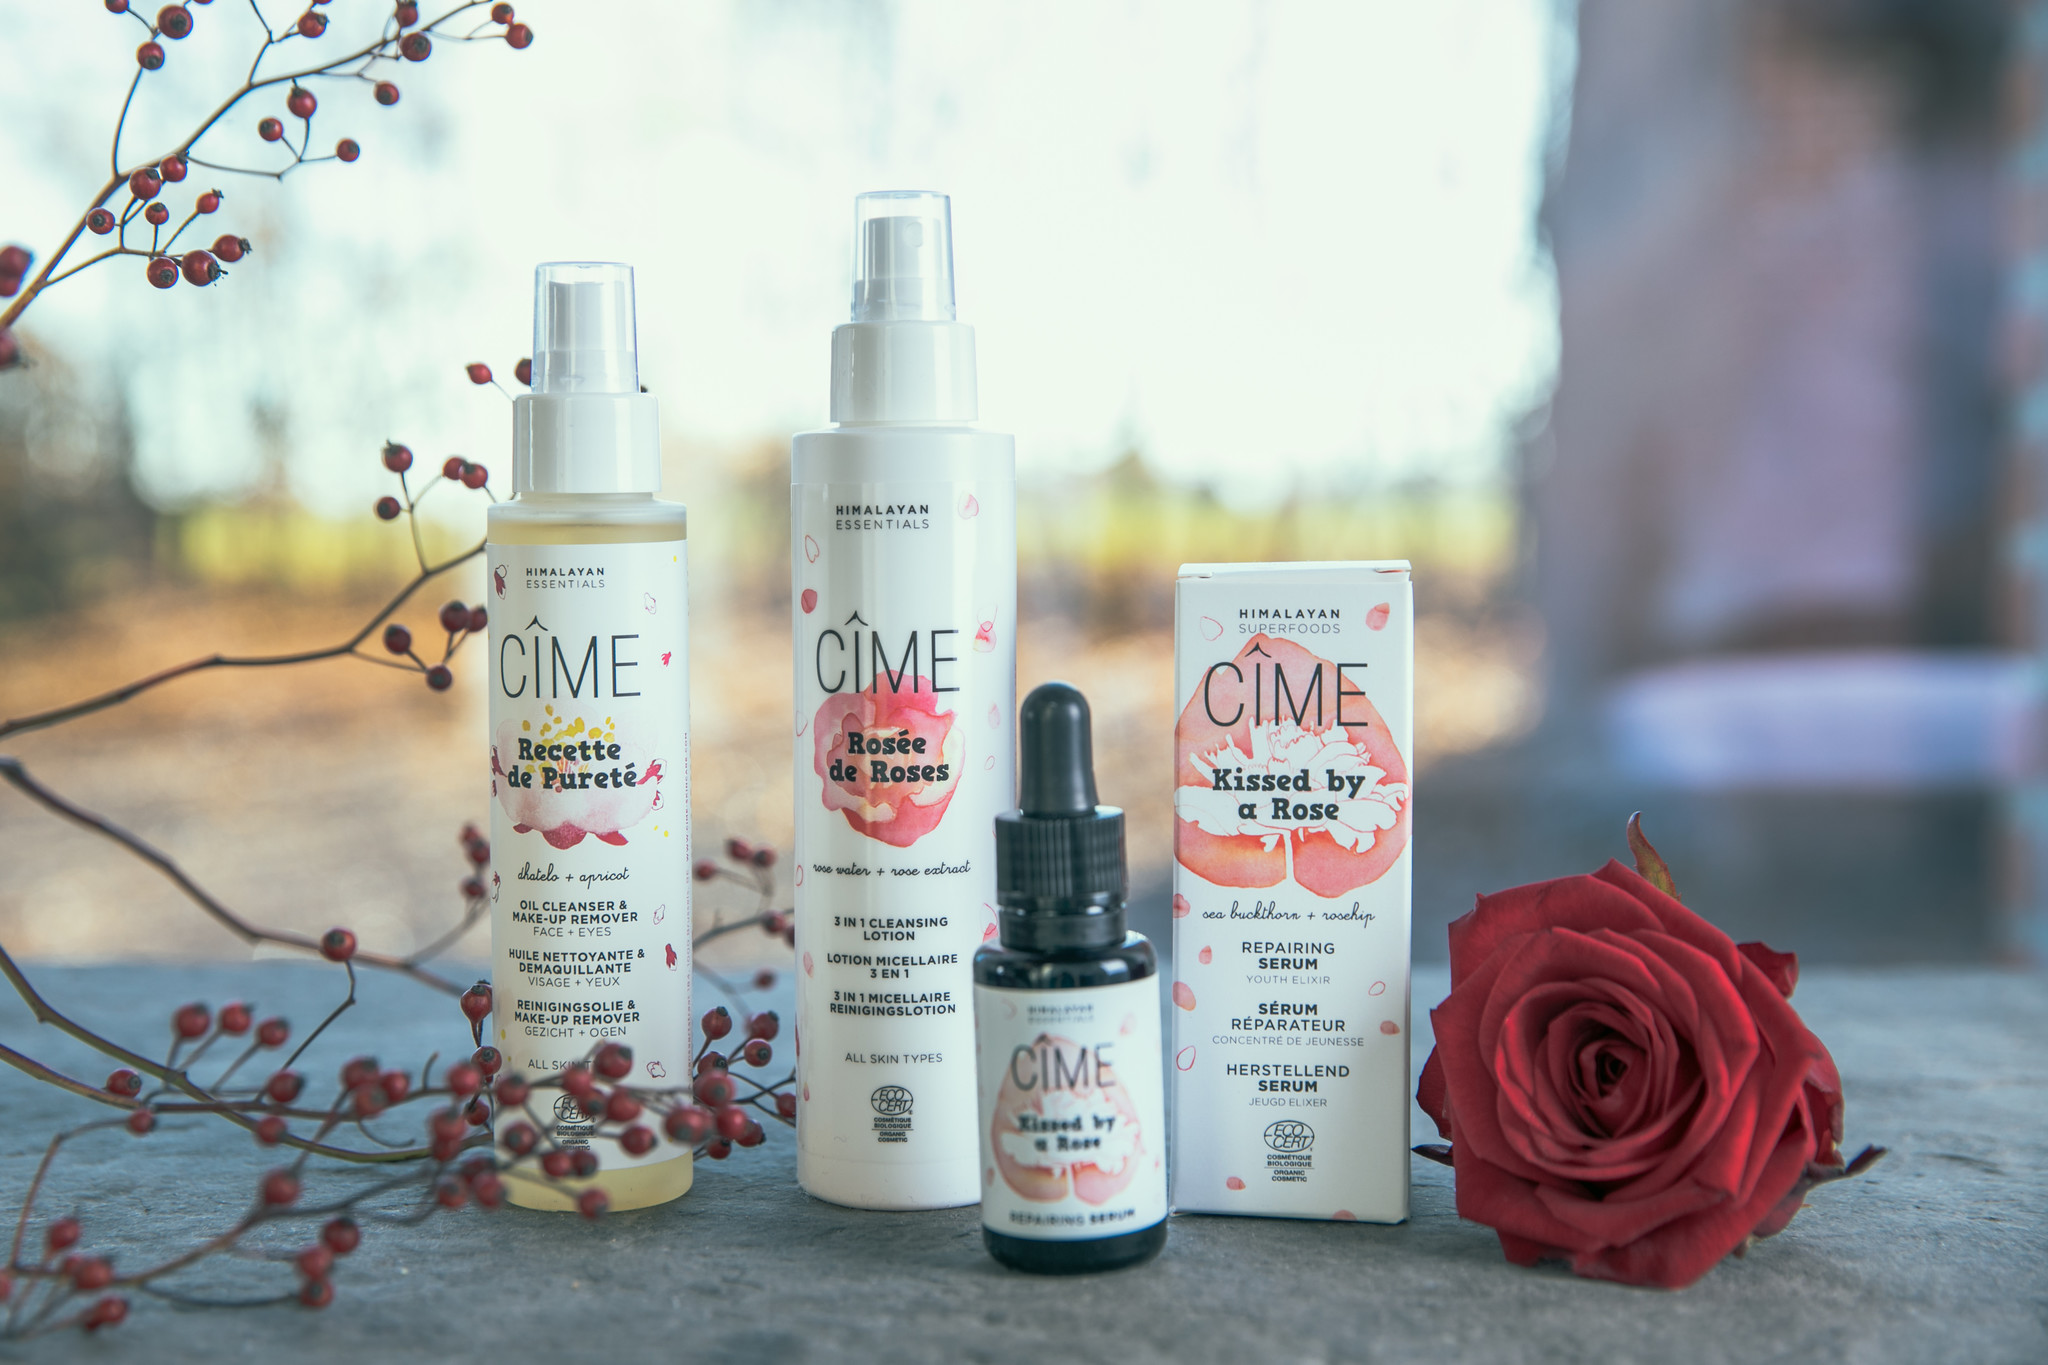 Herstellend serum - Kissed by a Rose - Cîme